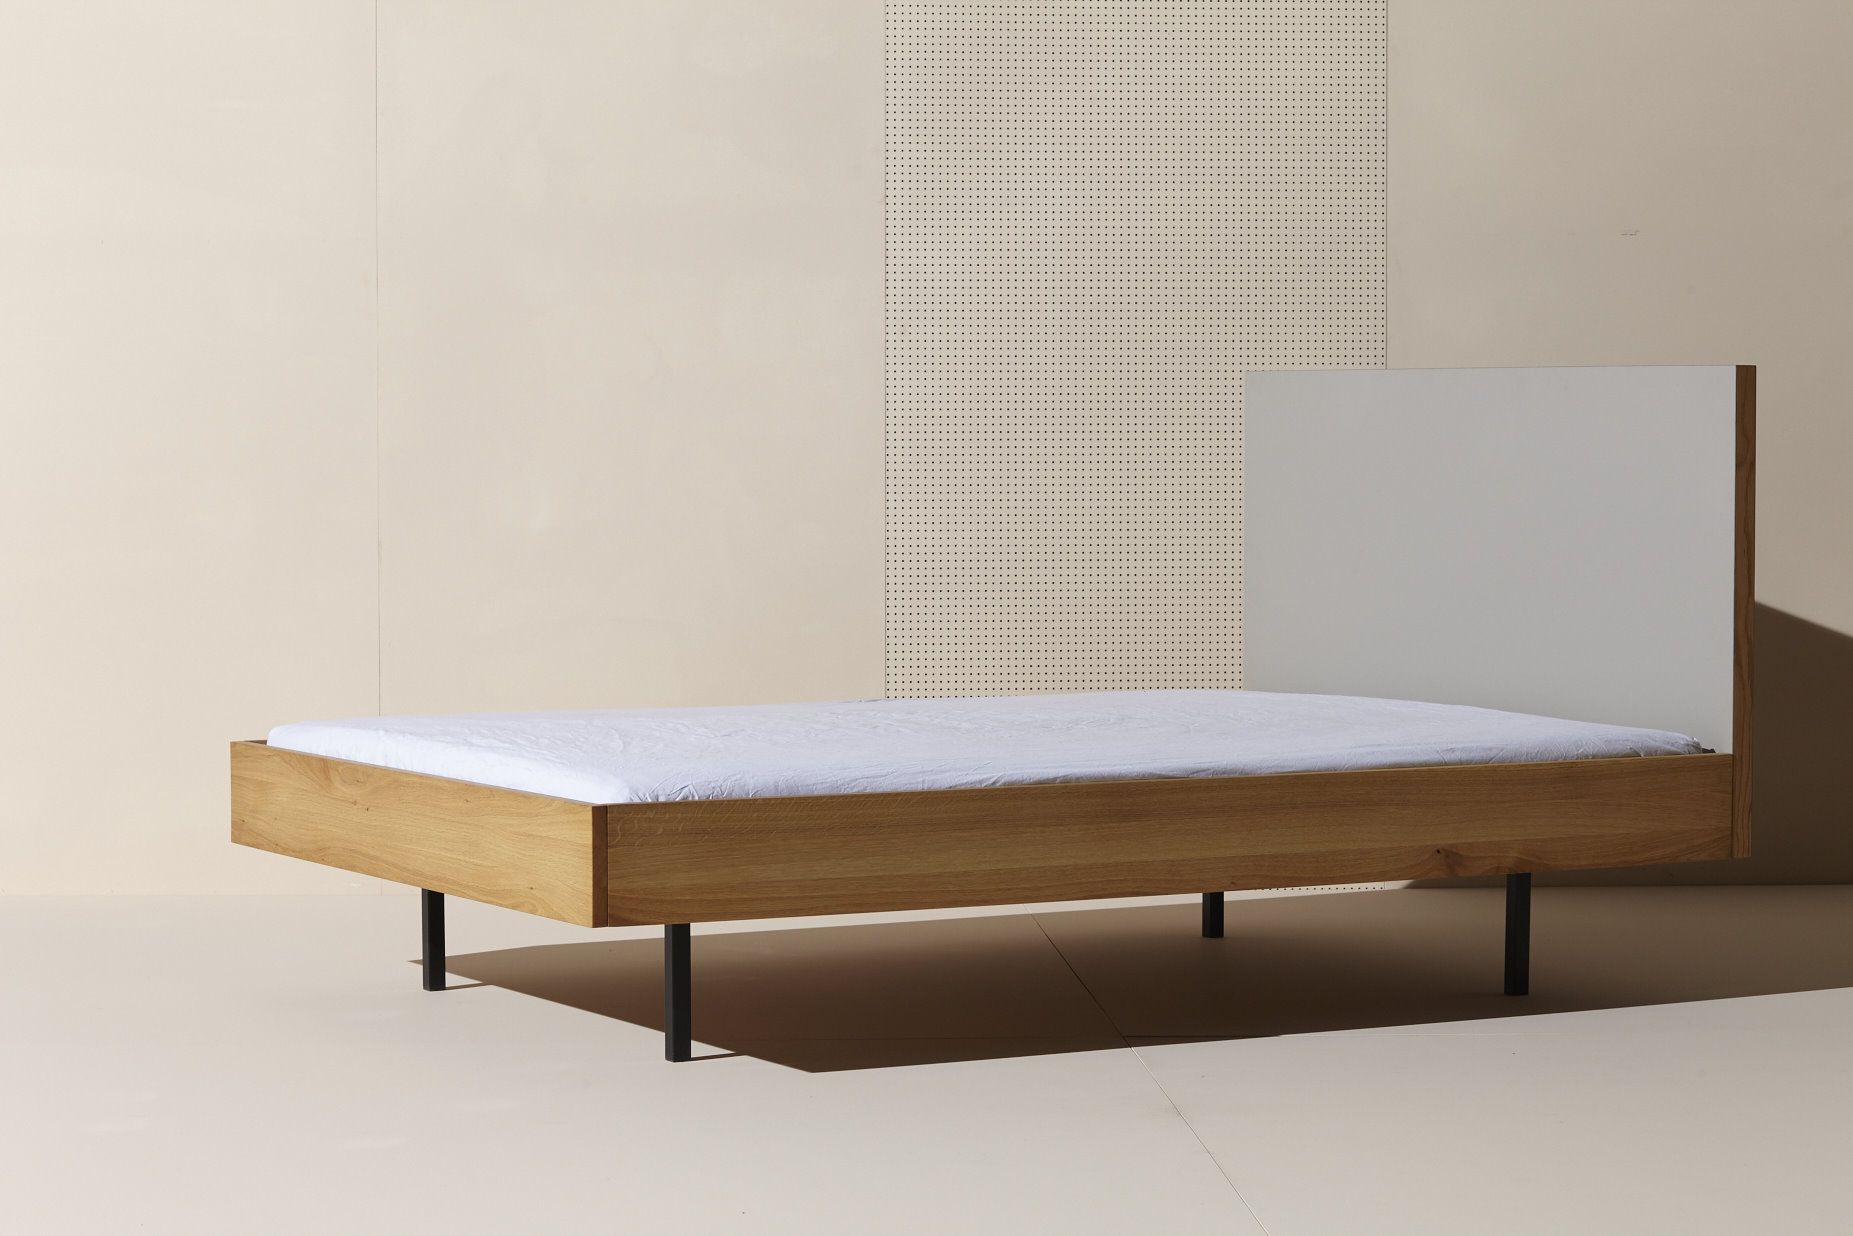 unidorm bett material linoleum massive eiche ge lt photo by amosfricke bett unidorm. Black Bedroom Furniture Sets. Home Design Ideas